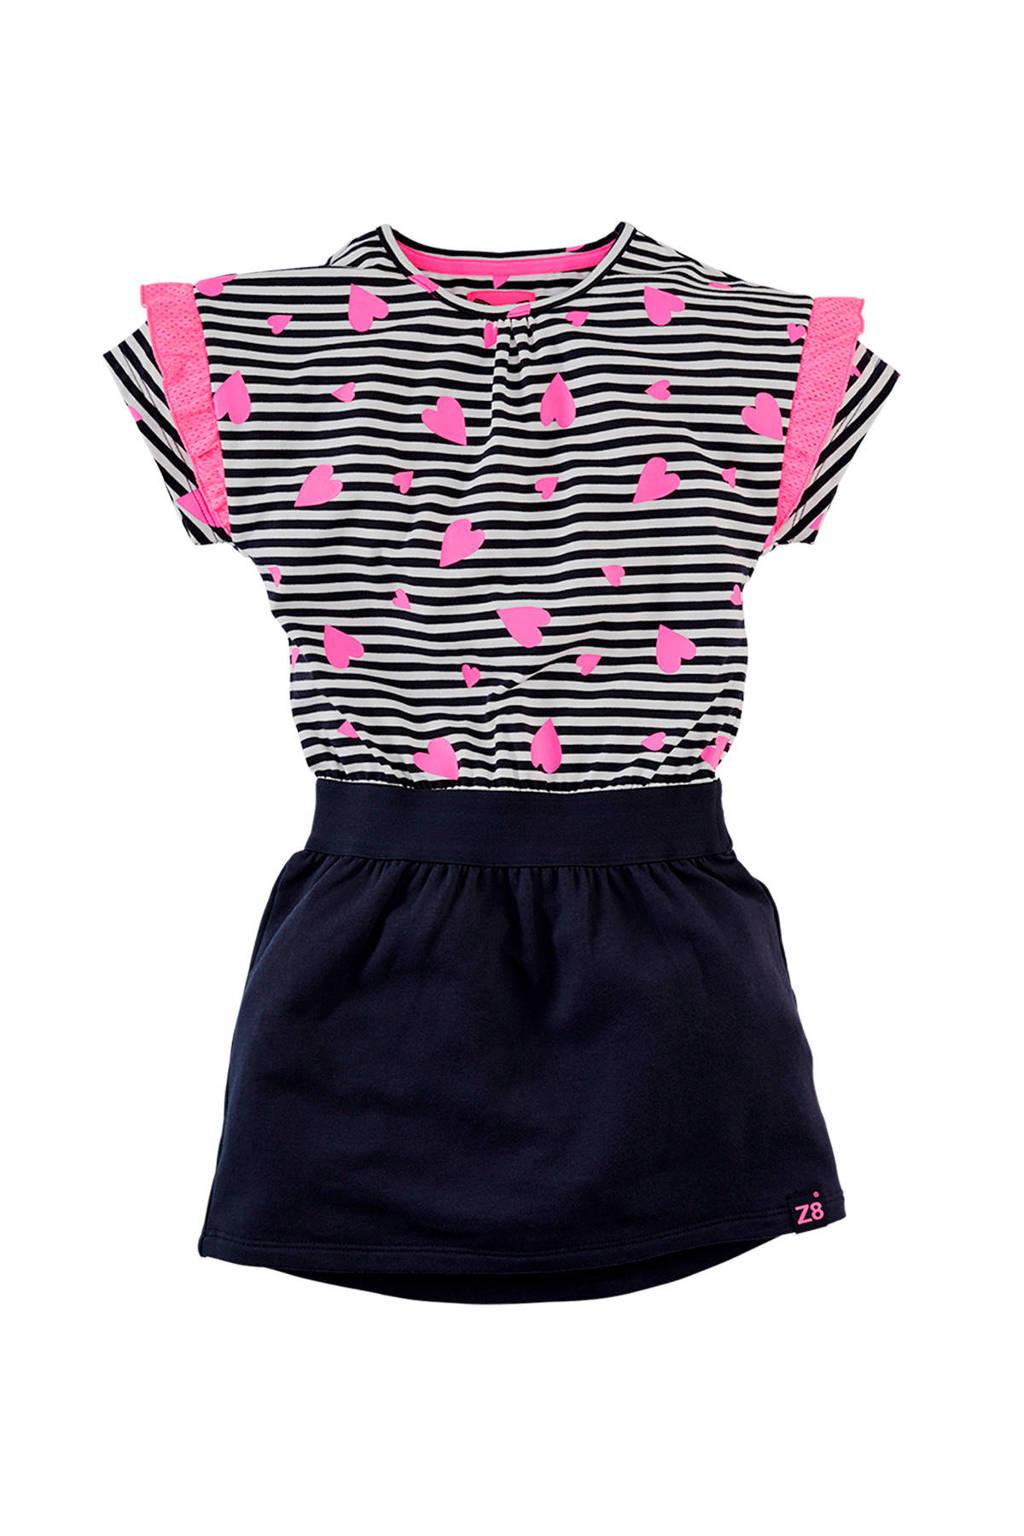 Z8 gestreepte jersey jurk Danique donkerblauw/wit/neon roze, Donkerblauw/wit/neon roze